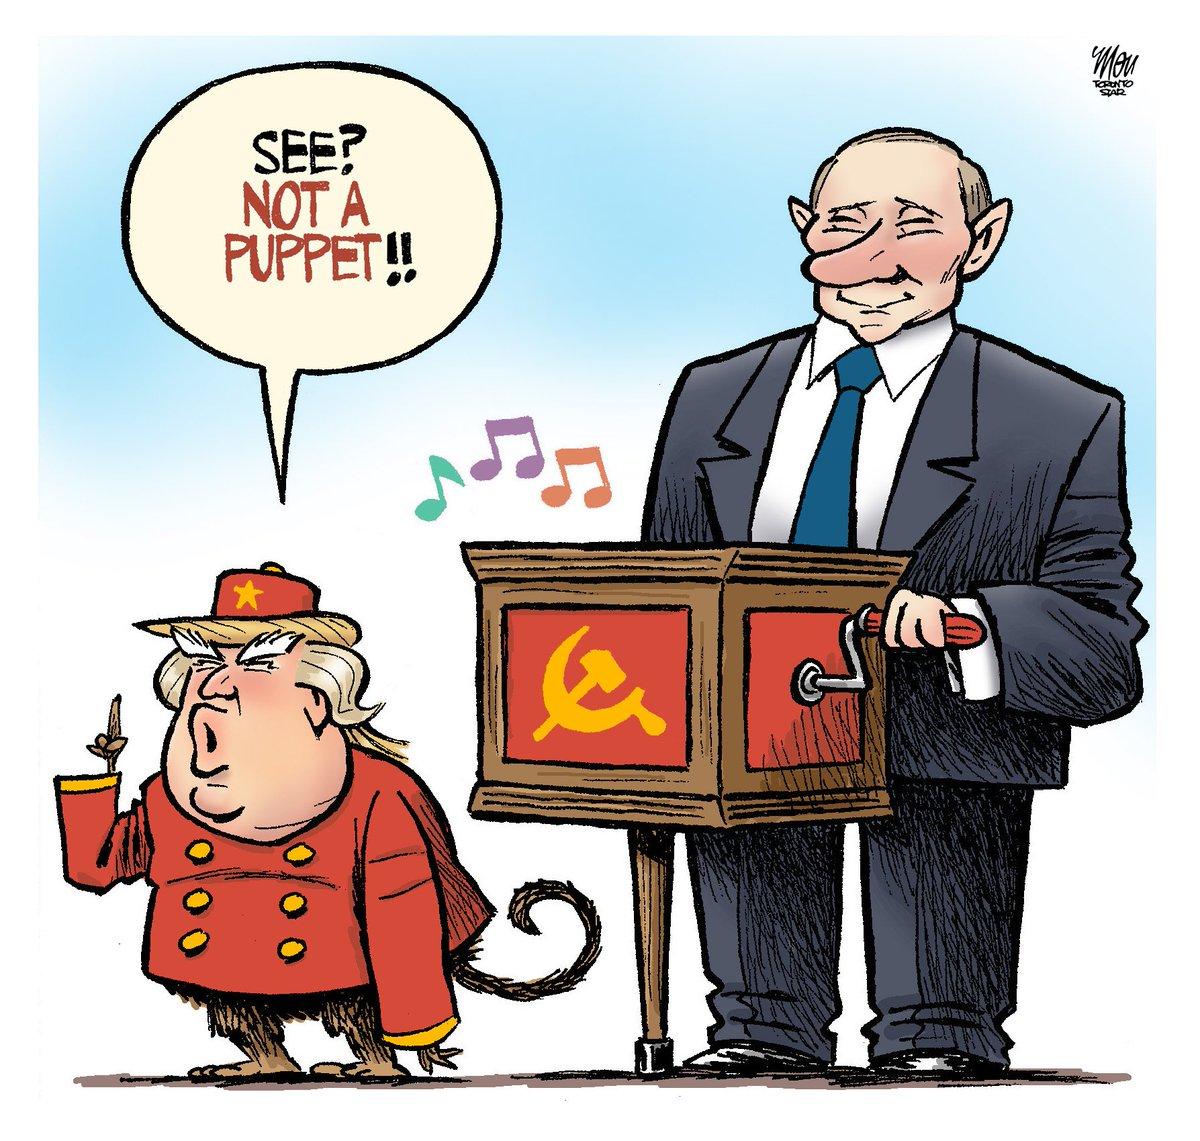 Here's Tuesday's #Helsinki cartoon in @TorontoStar #DonaldTrump #VladimirPutin